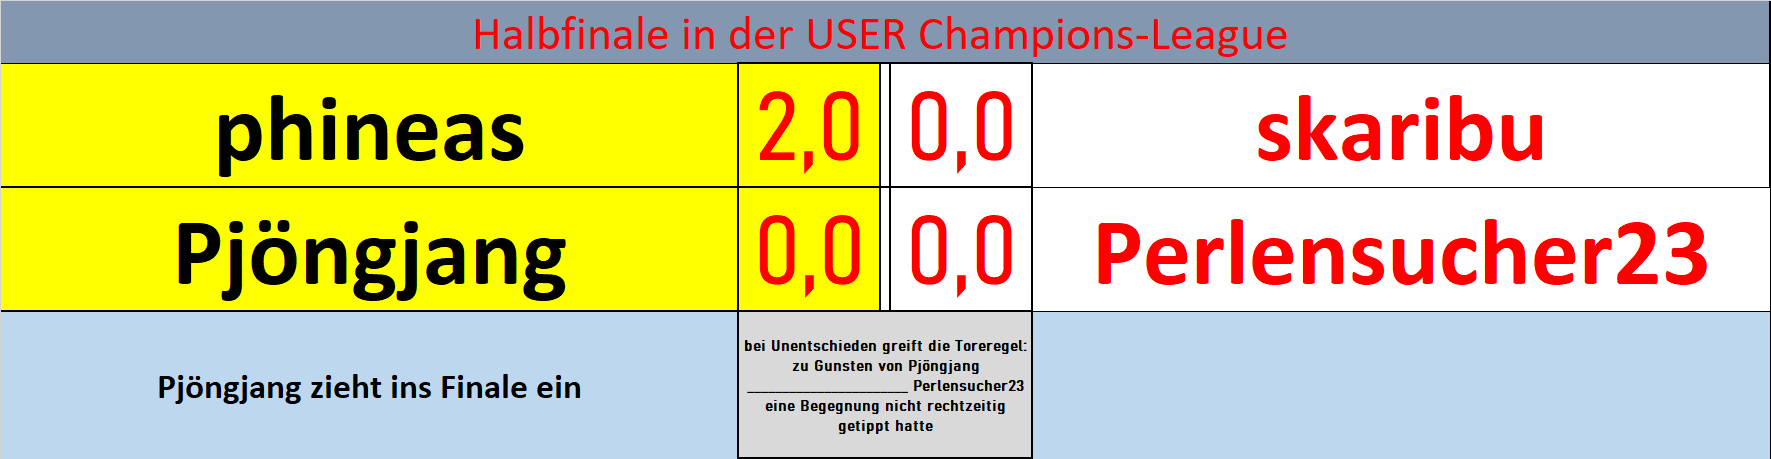 user_halbfinal_endergebnisse.png